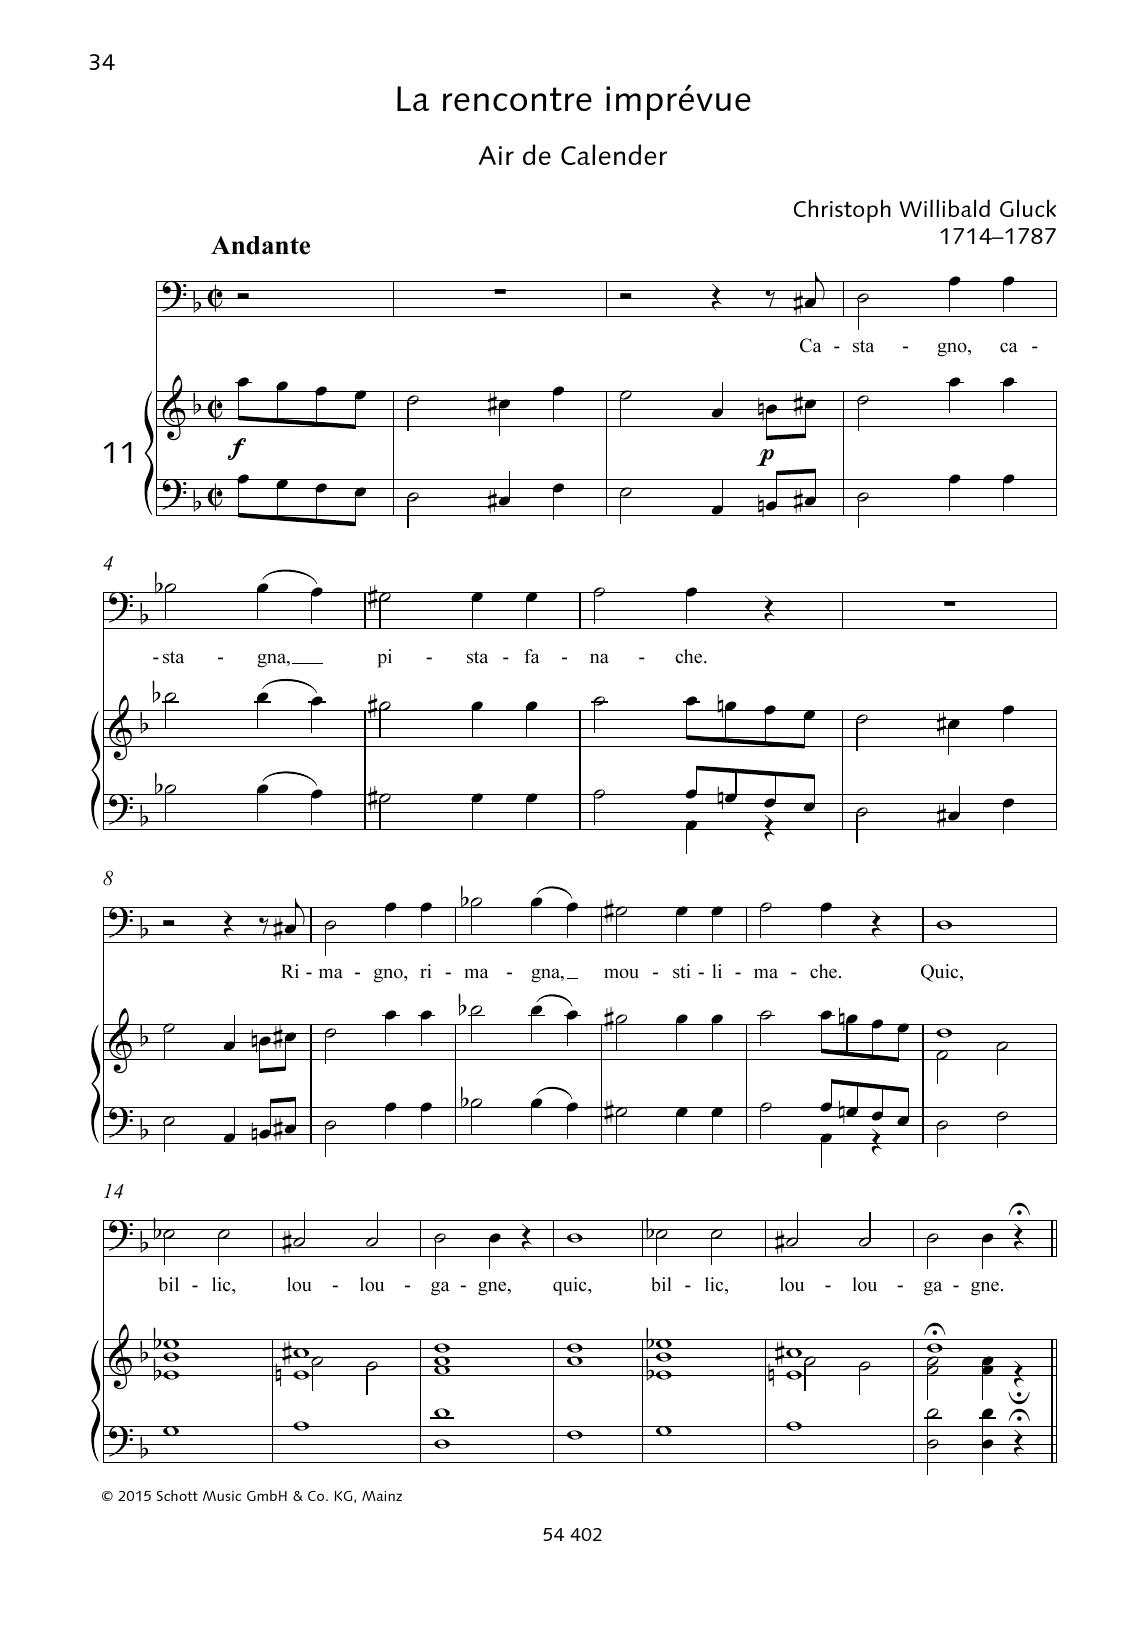 Castagno, castagna, pistafanache Sheet Music